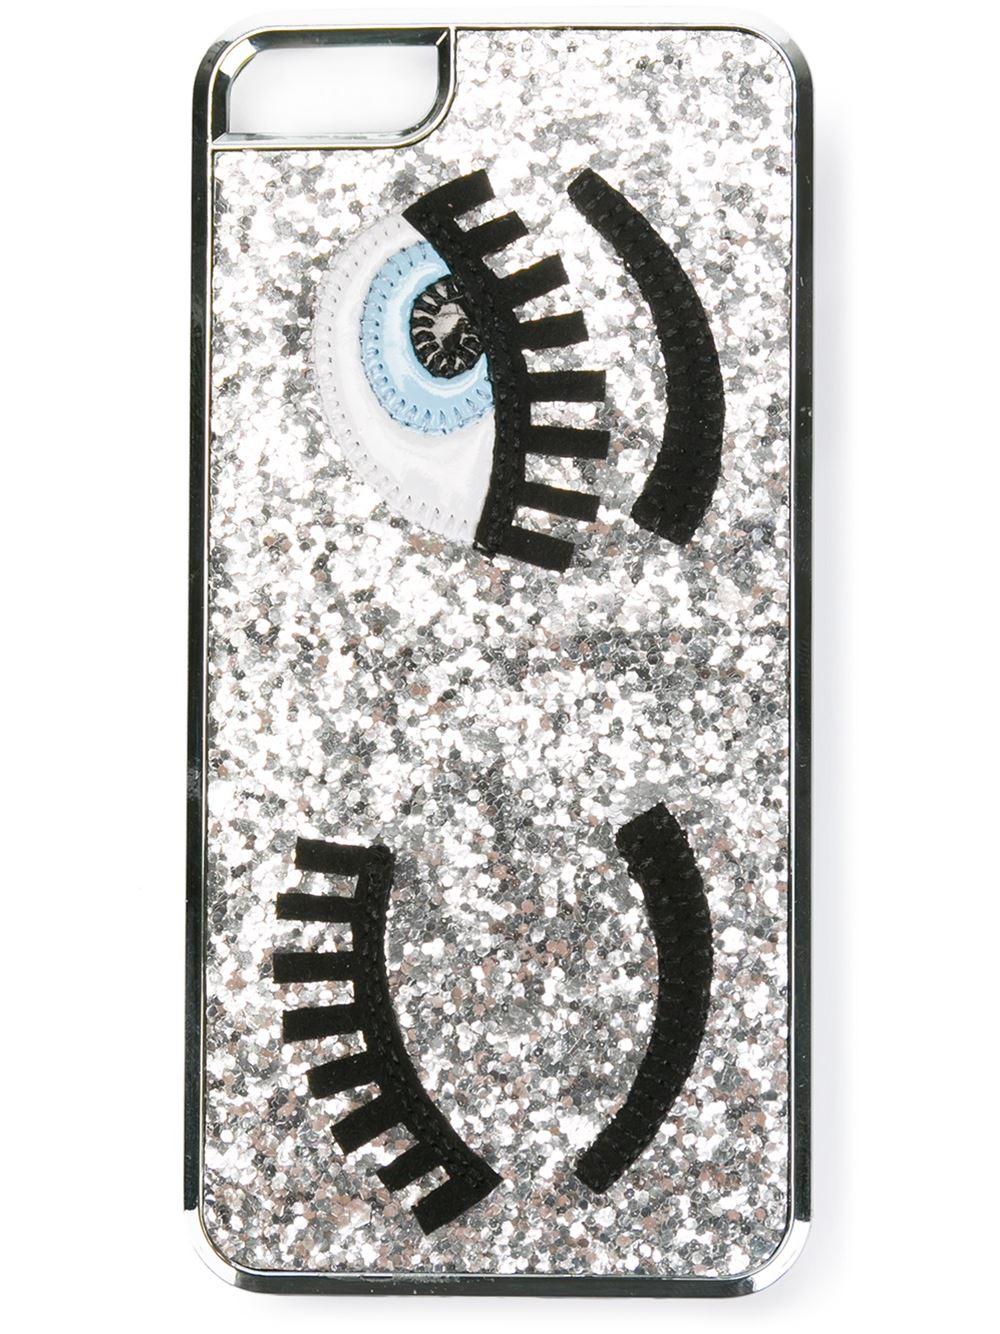 flirt app iphone x case